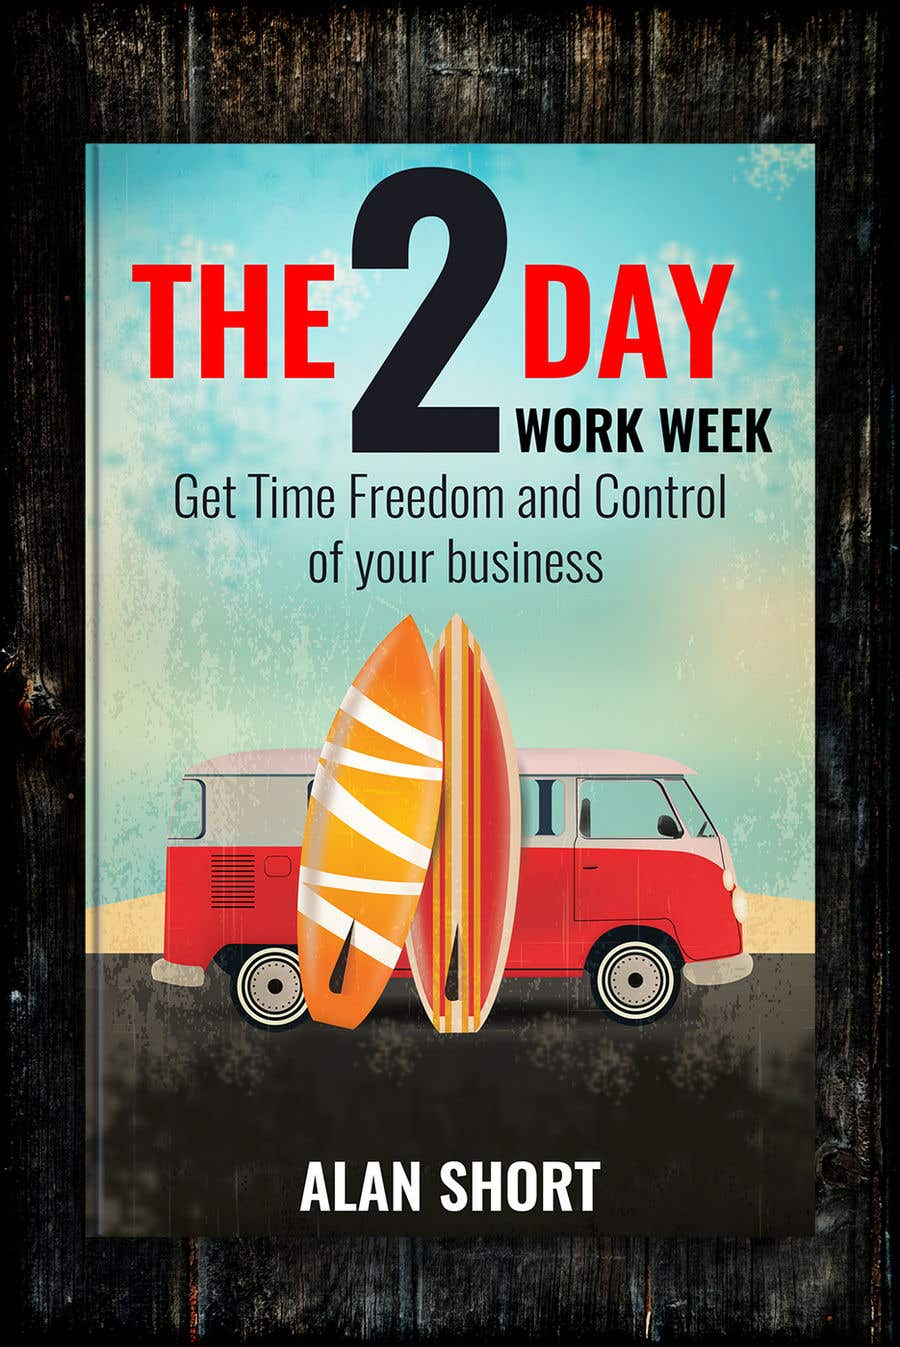 Bài tham dự cuộc thi #33 cho Book Cover 2 Day Work Week